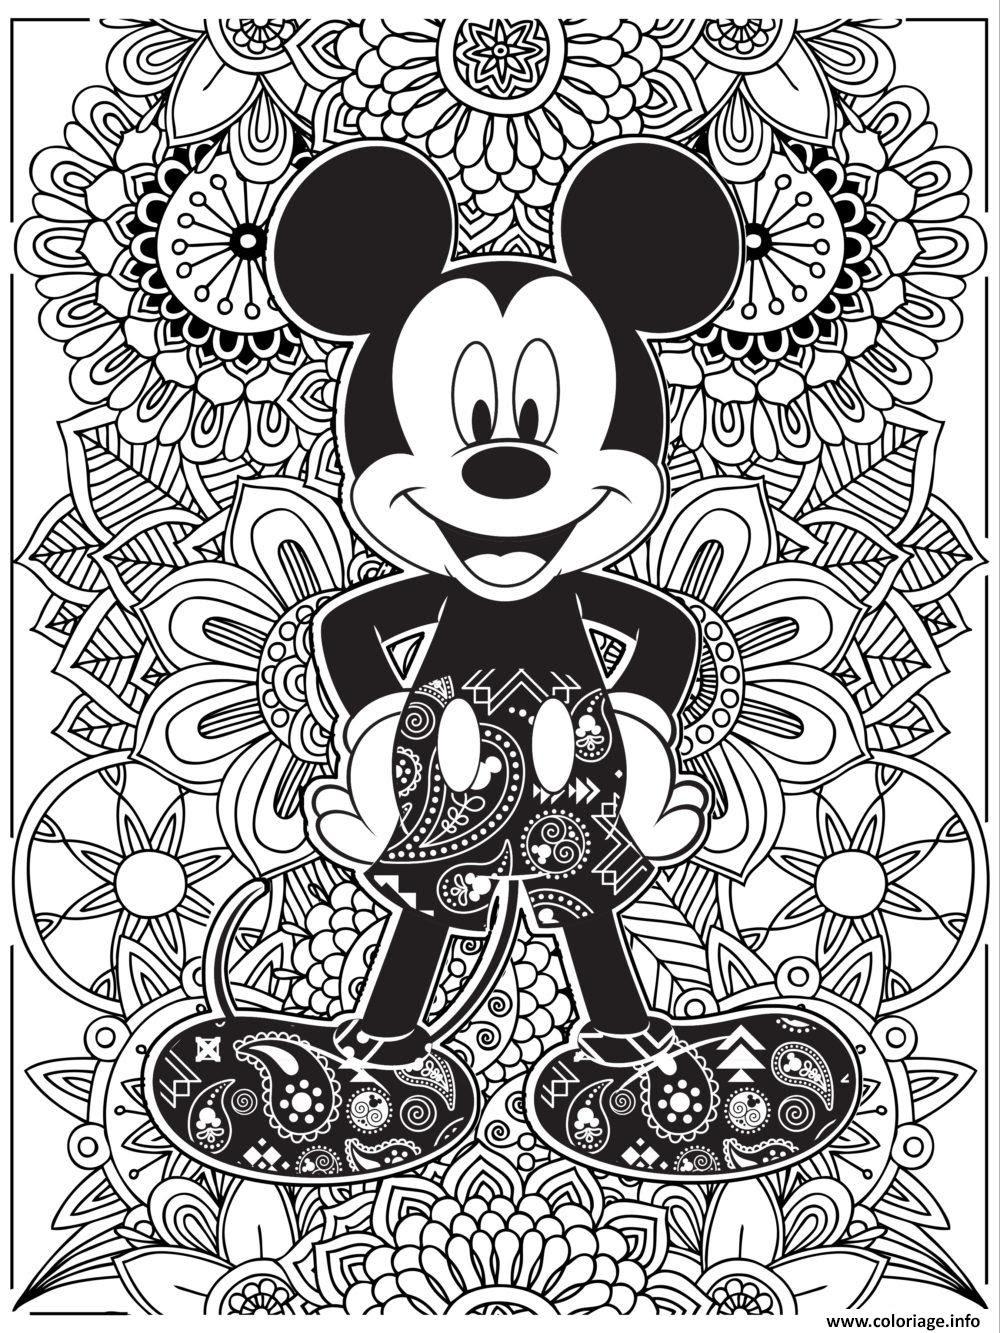 Coloriage Mandala Disney Mickeymouse Hd Dessin  Imprimer